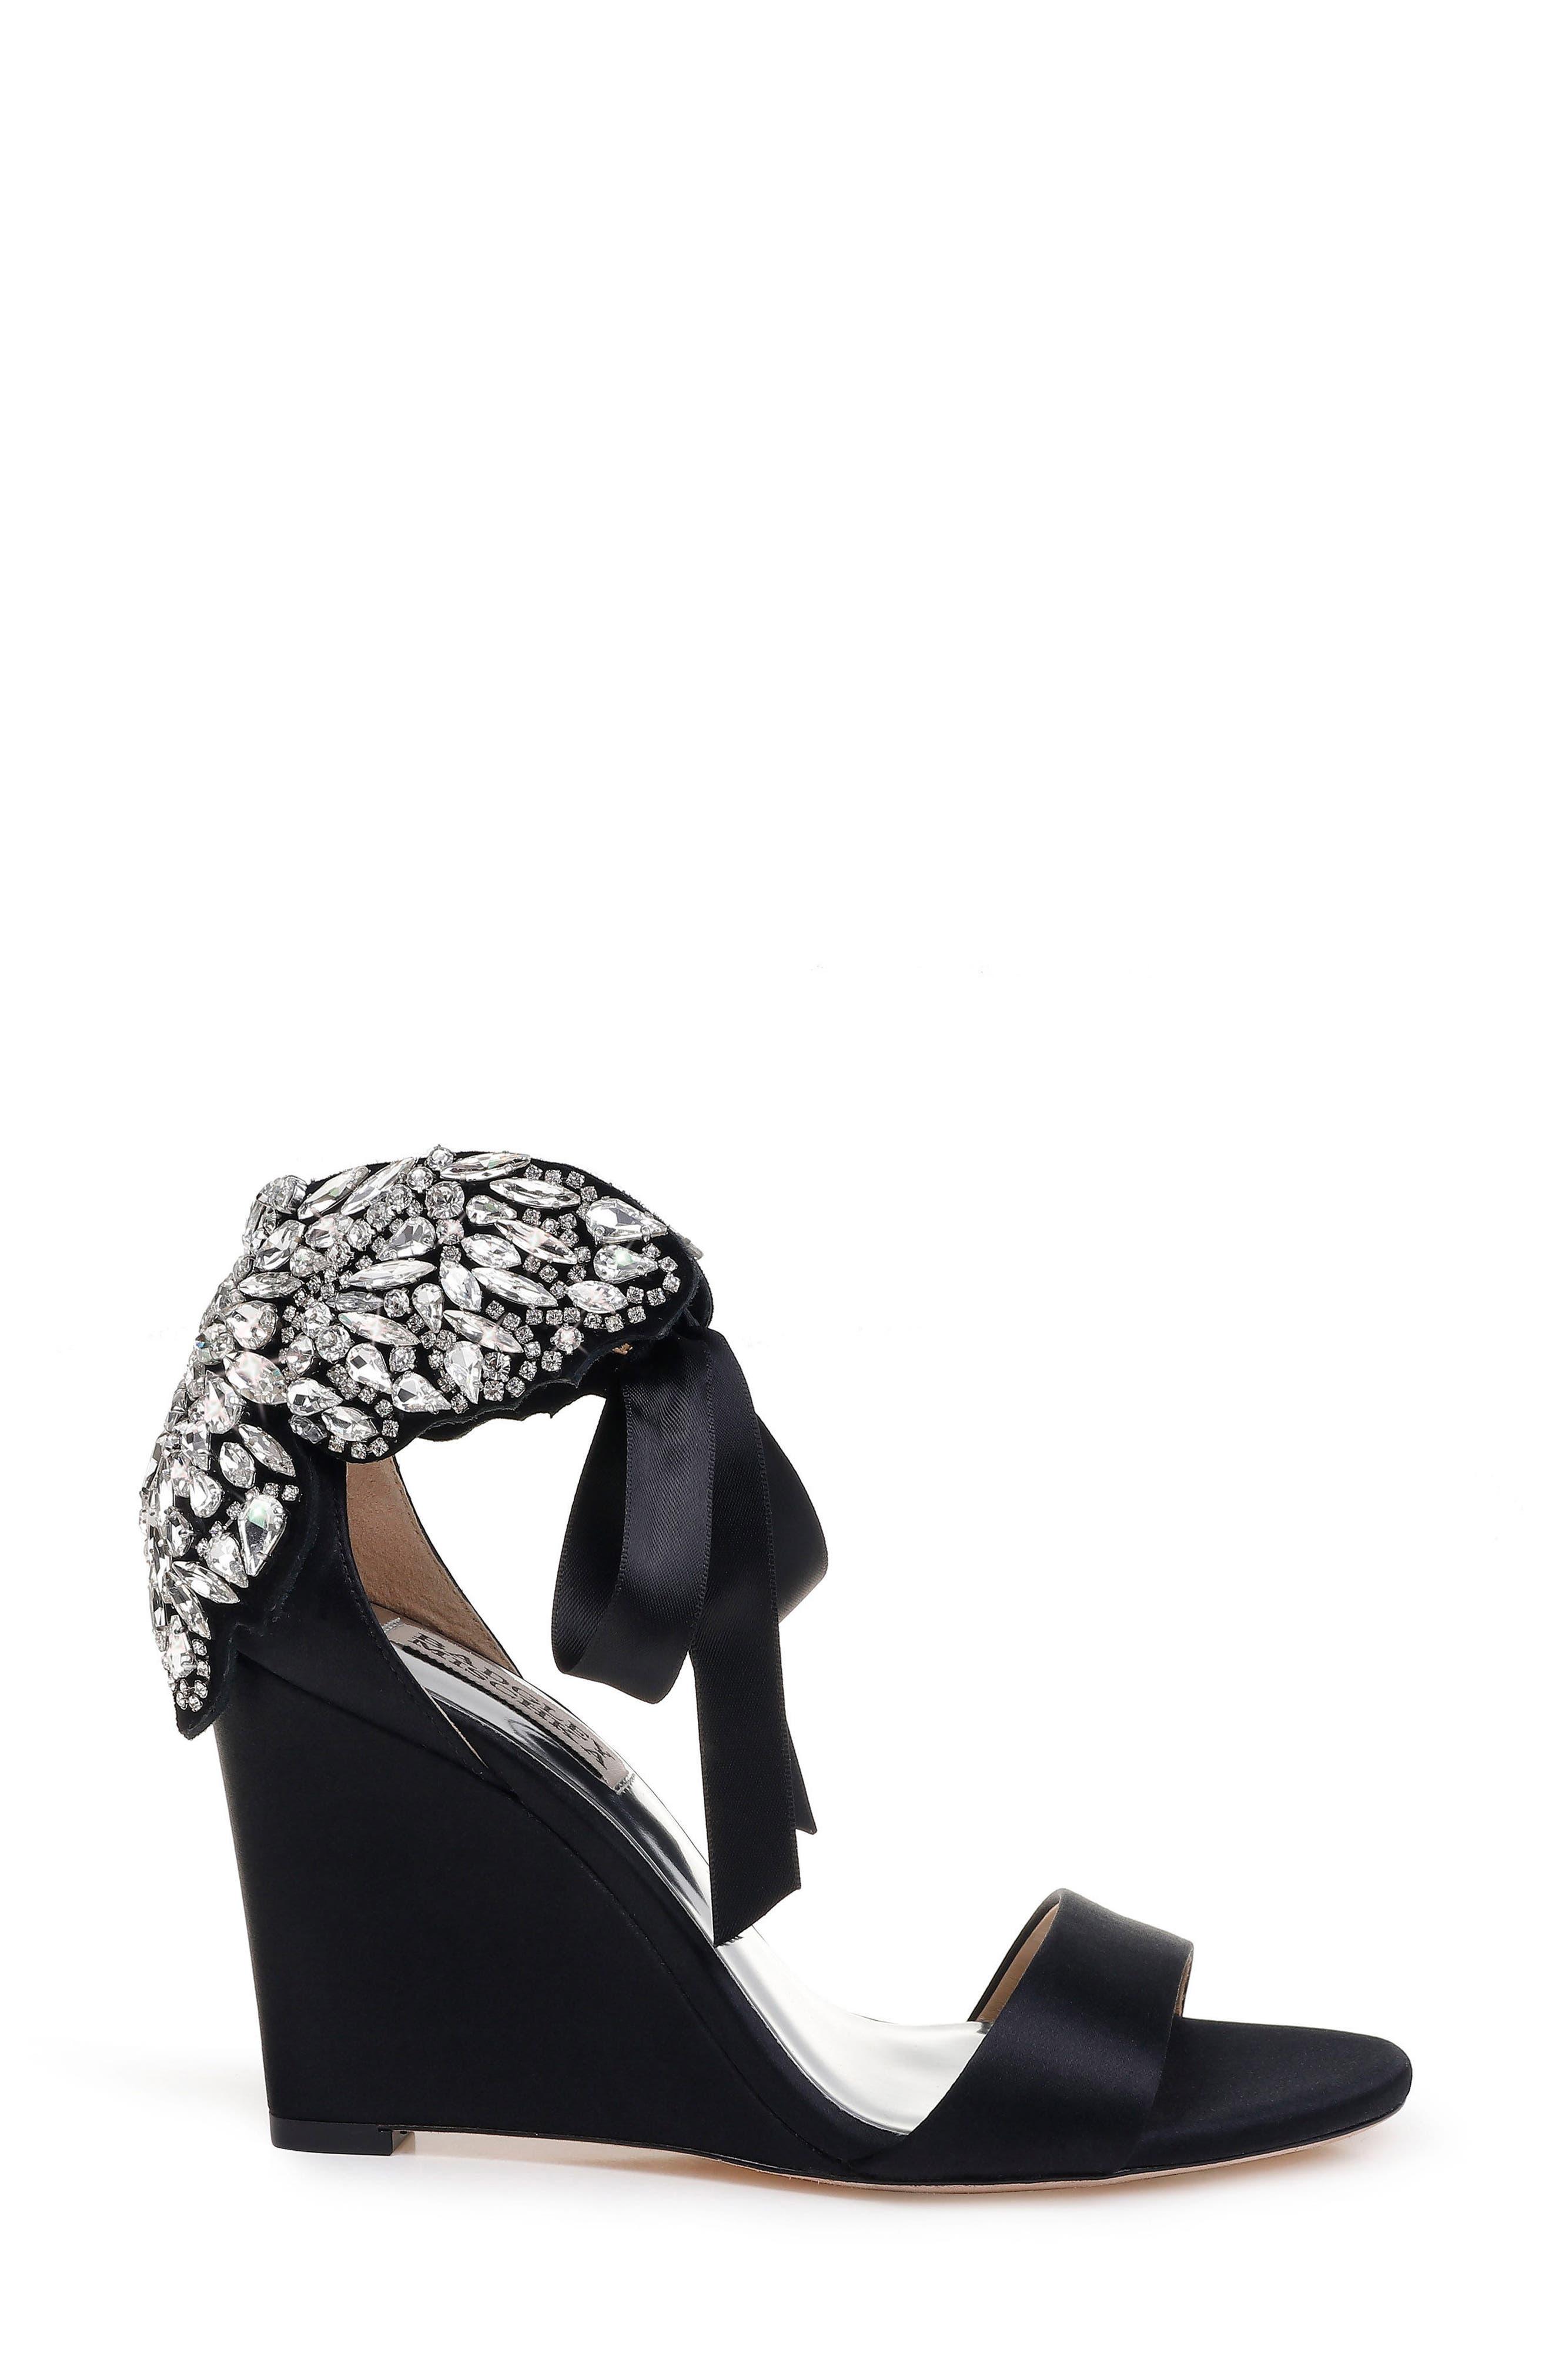 Badgley Mischka Heather Crystal Embellished Wedge,                             Alternate thumbnail 3, color,                             BLACK SATIN